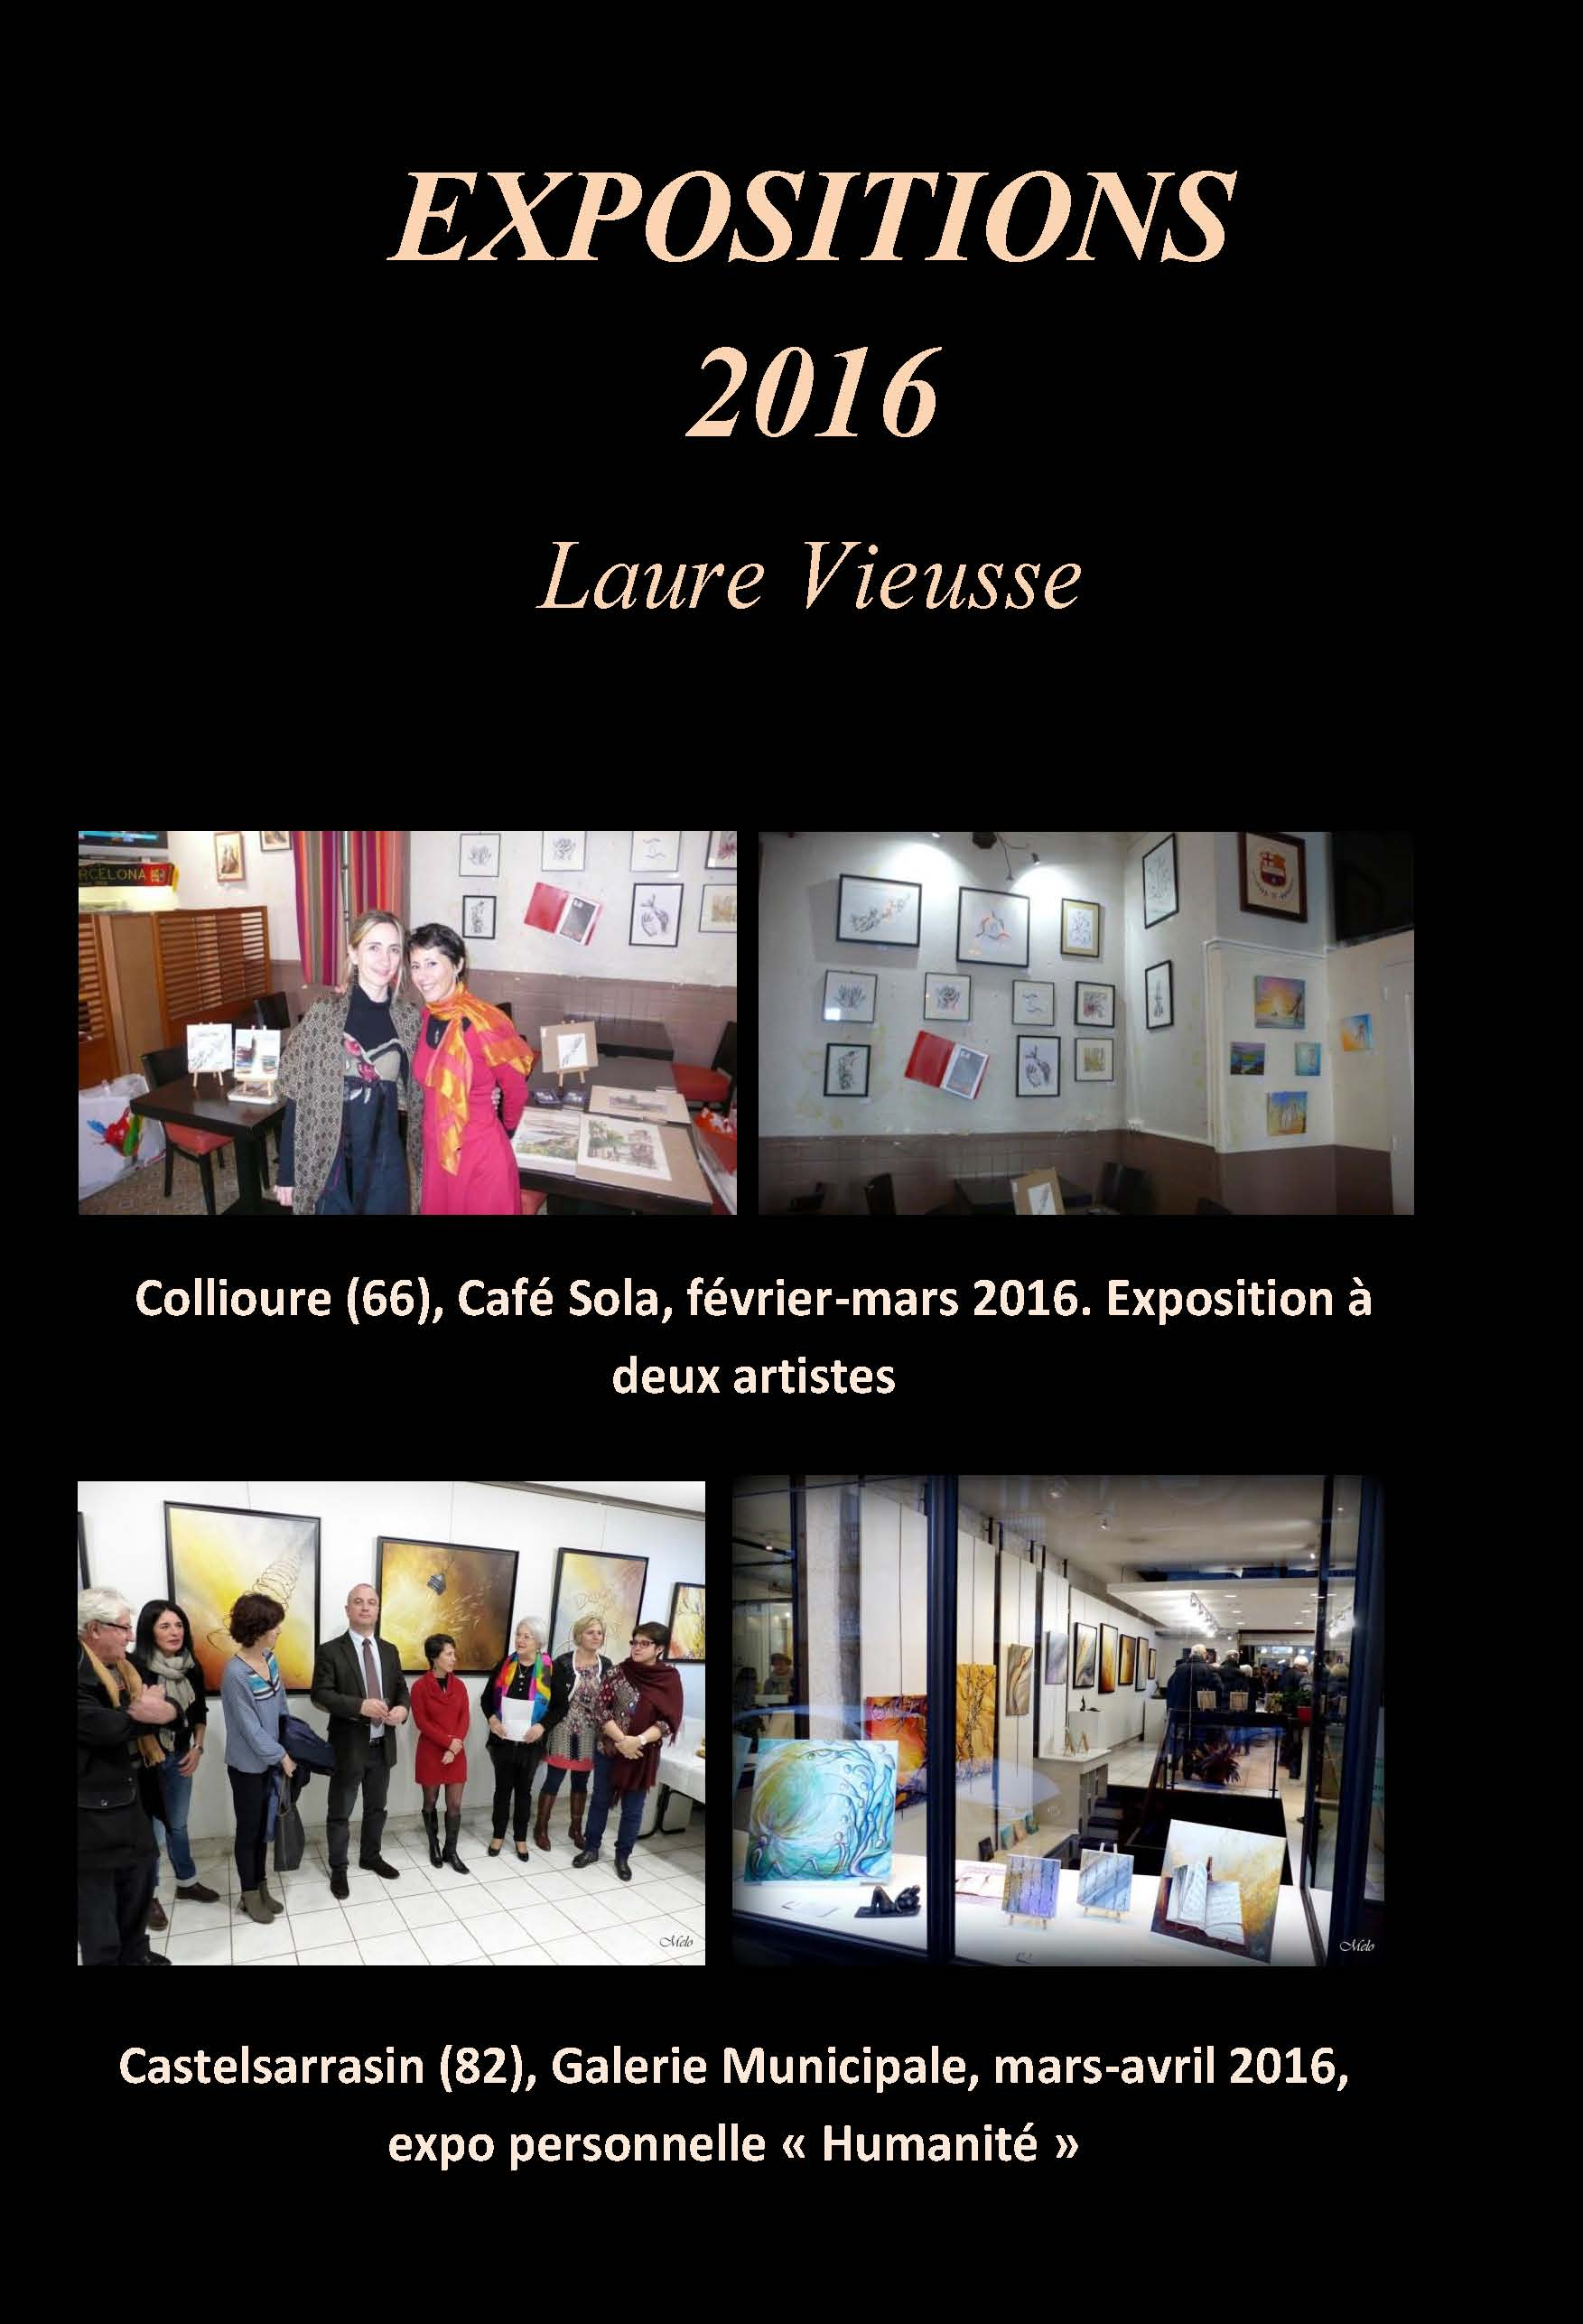 expos 2016 recapitulatif en images_Page_1.jpg